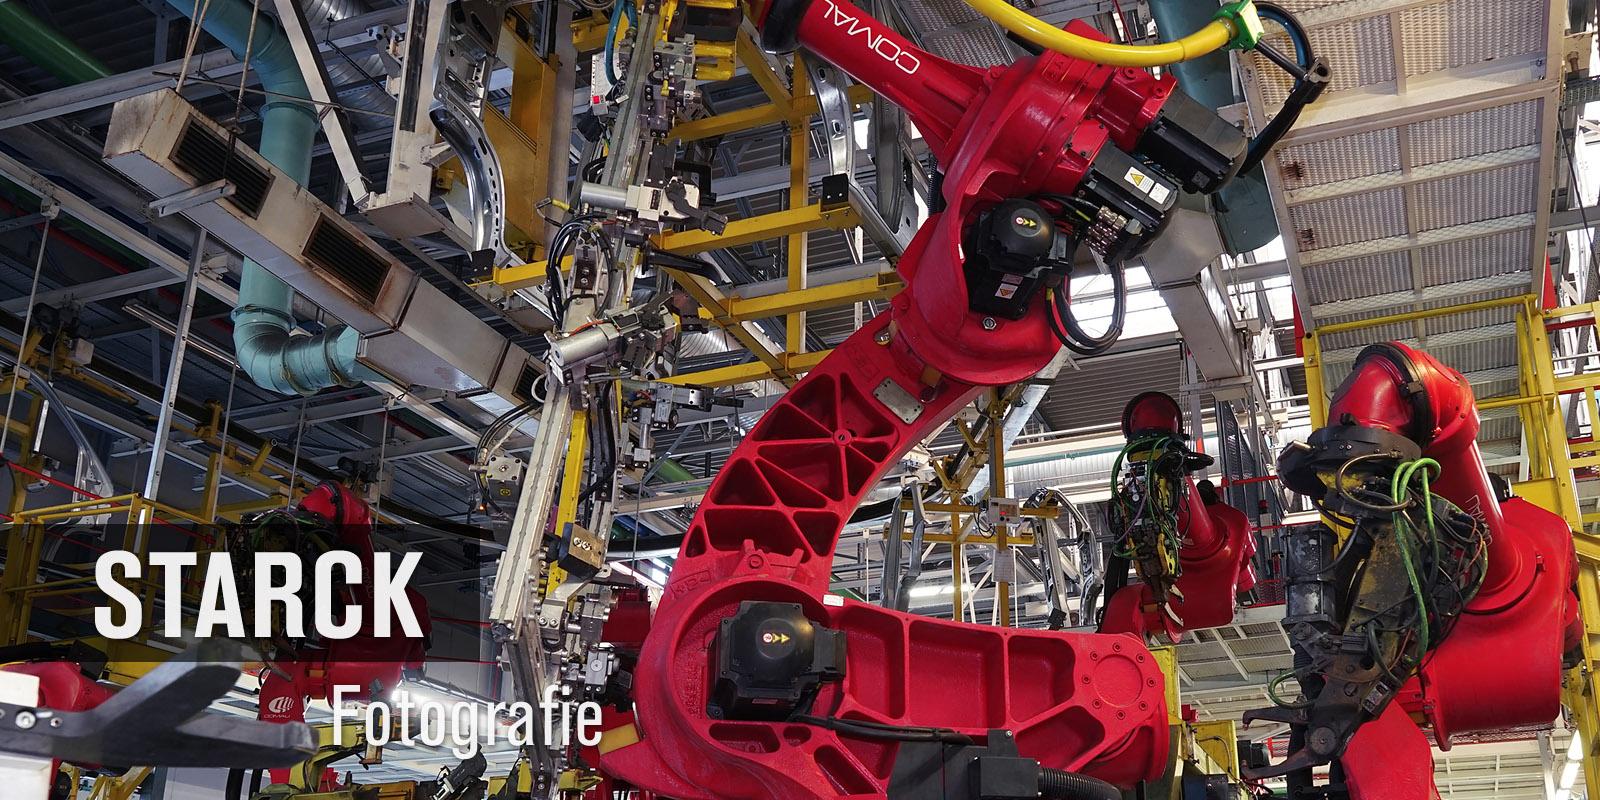 Taktstraße Fahrzeugbau - Thomas Starck Industriefotografie